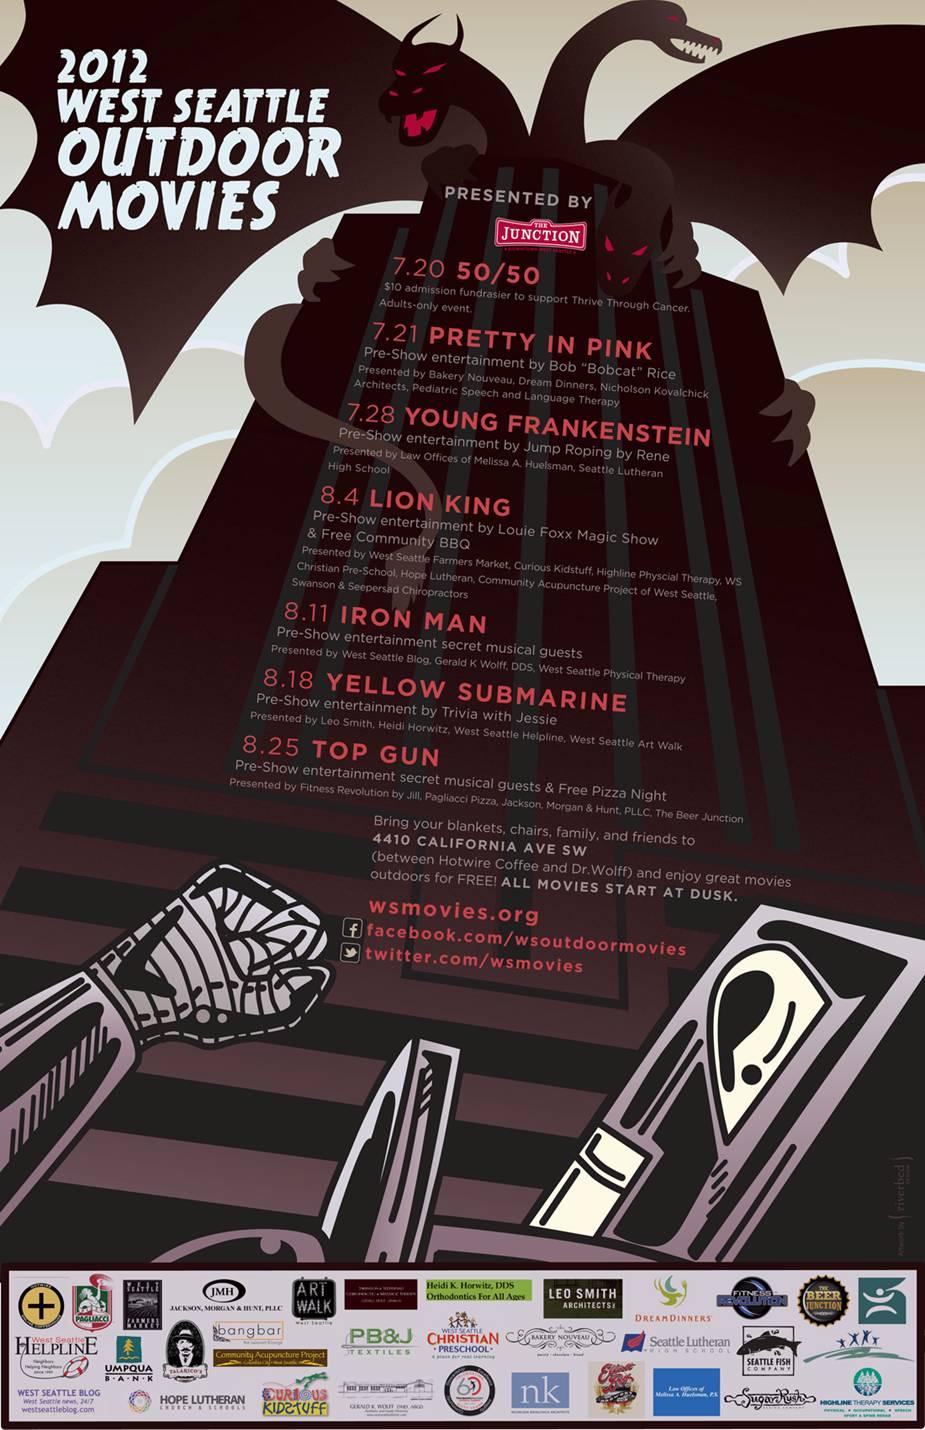 West Seattle Outdoor Movies | 2012 Schedule: <em>Young Frankenstein</em>, <em>Yellow Submarine</em>, <em>Iron Man</em>, & More